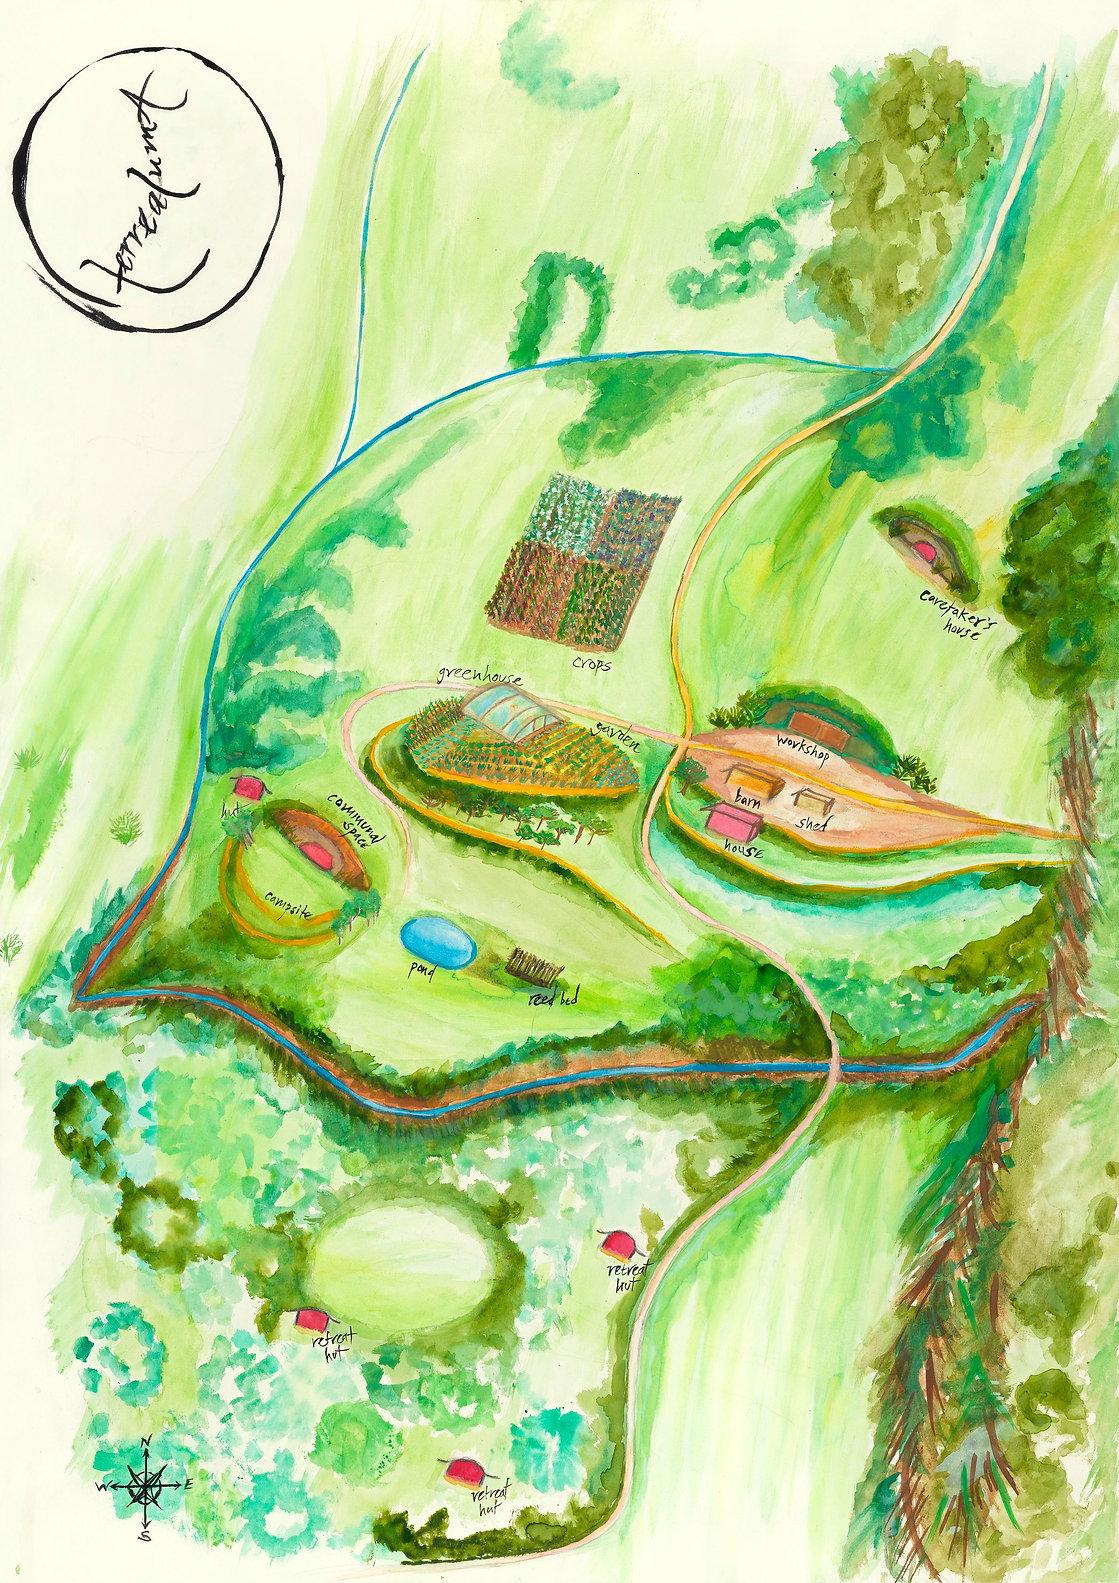 map, terrealuma, land, garden, forest, crops, buildings